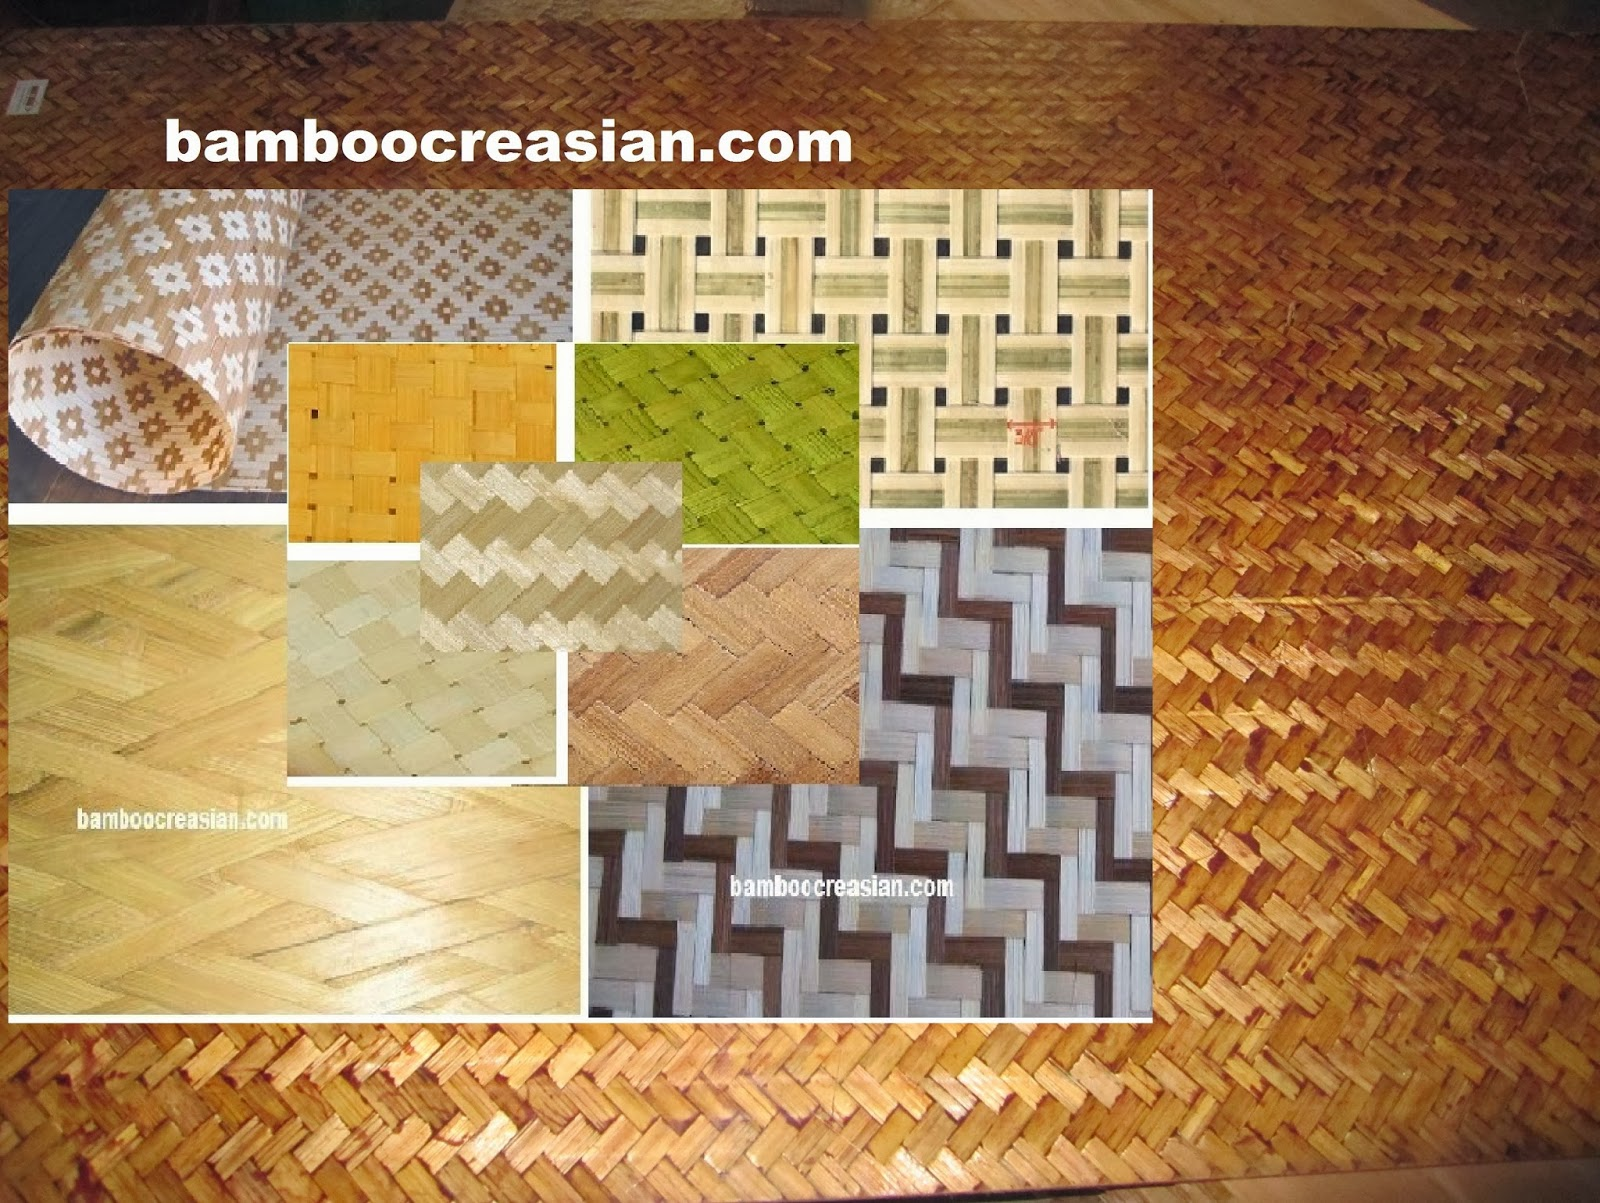 Rolled Bamboo Fences Bamboo Fencing Big Bamboo Poles Bamboo Wall